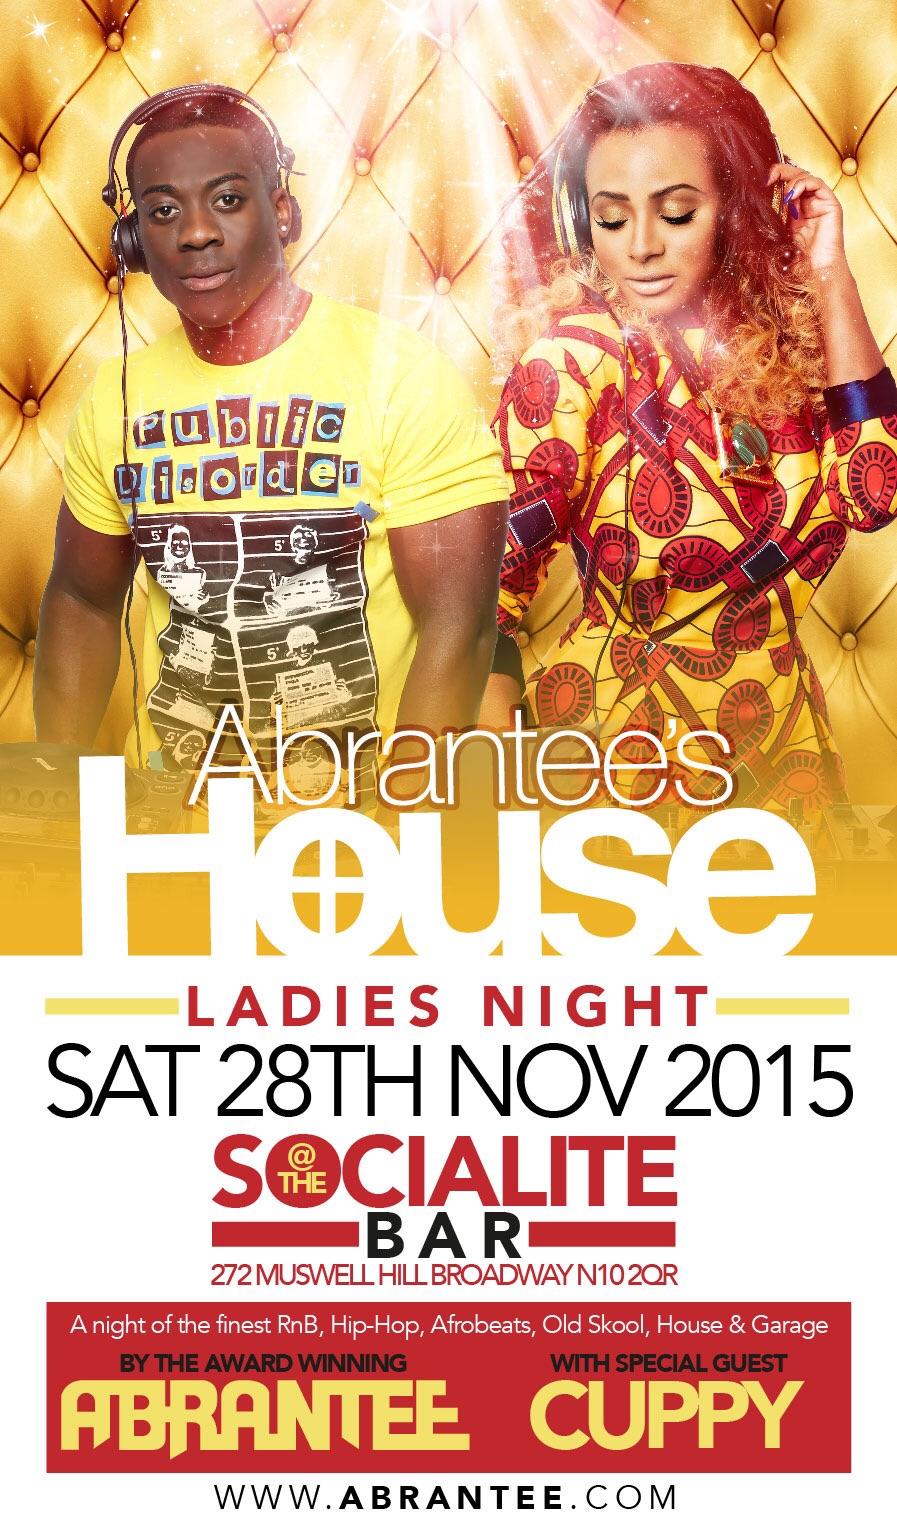 Abrantee's House Ladies night !!!!